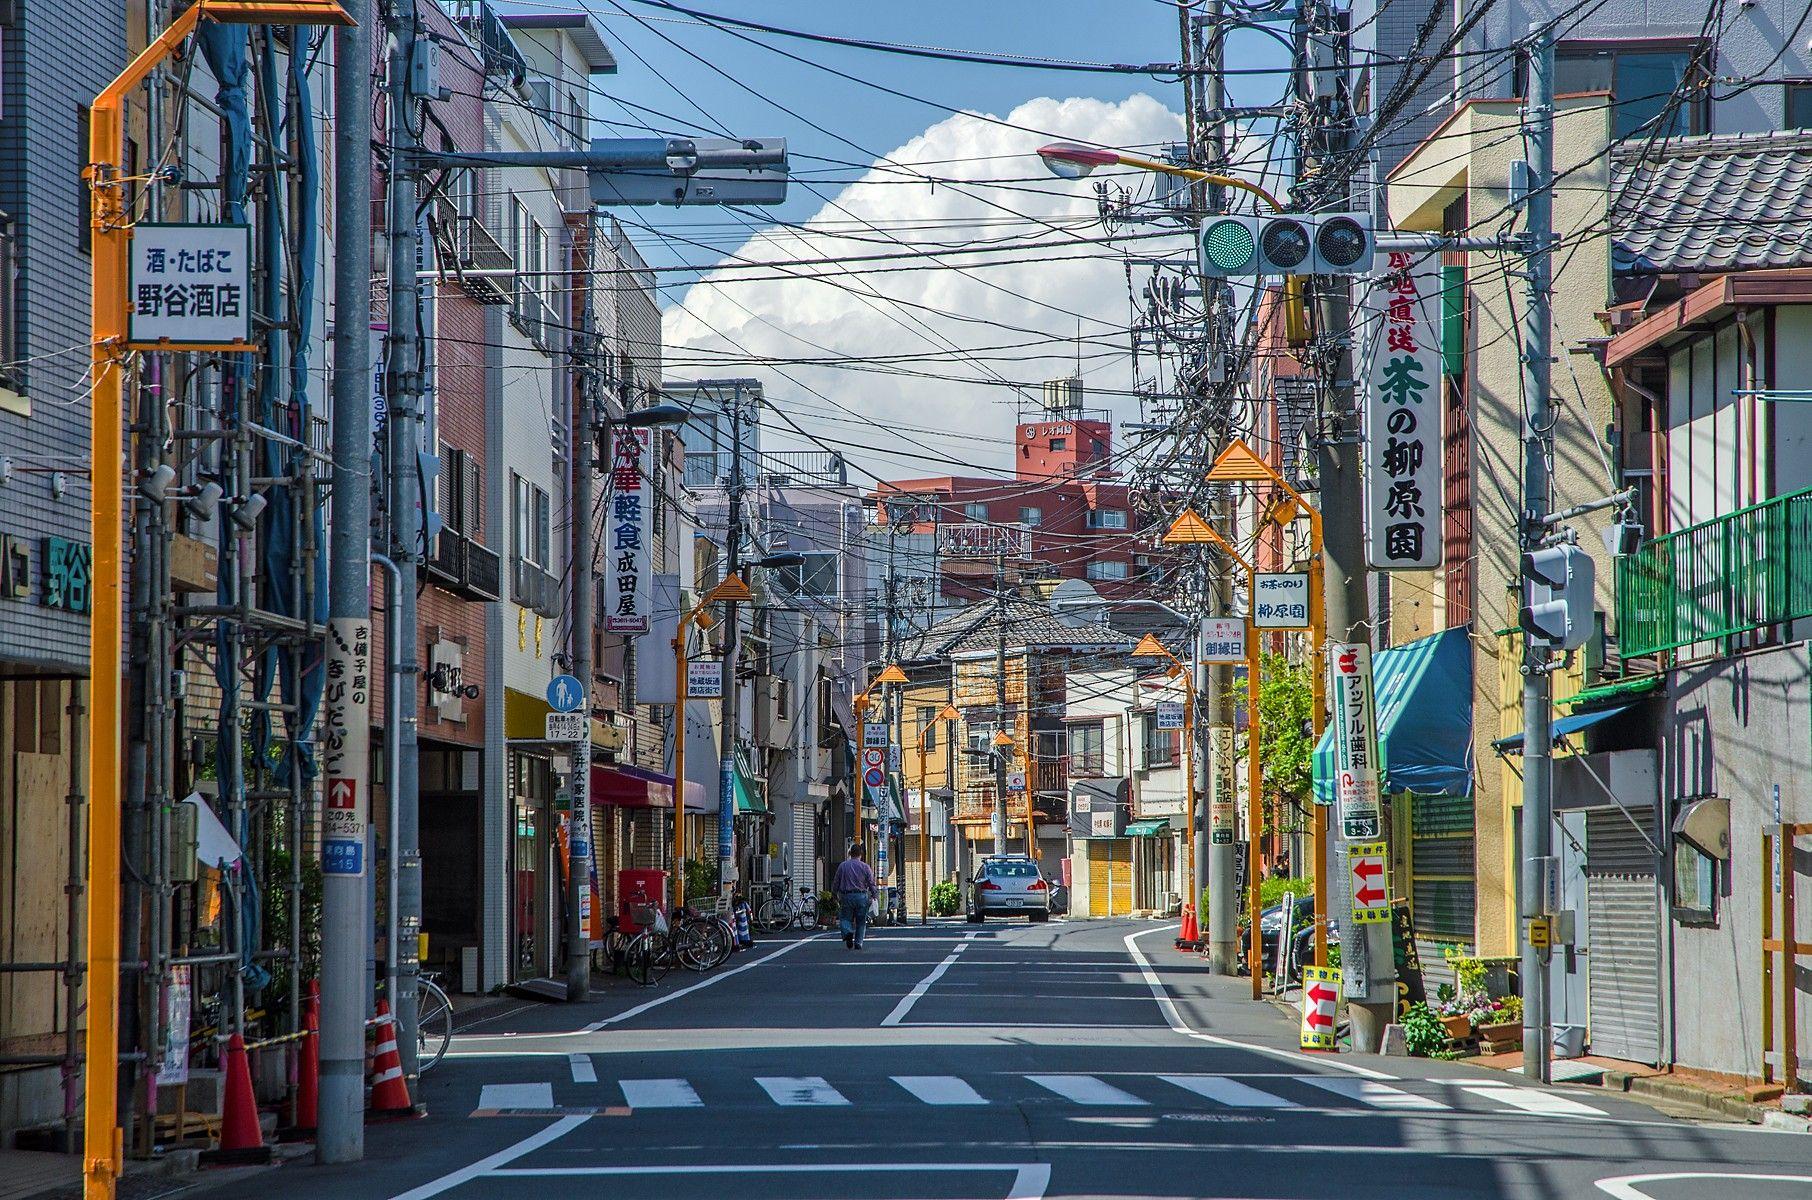 Outdoors Street Urban City Japan Tokyo Building Signs Sky Clou Anime Scenery Wallpaper Aesthetic Desktop Wallpaper Laptop Wallpaper Desktop Wallpapers